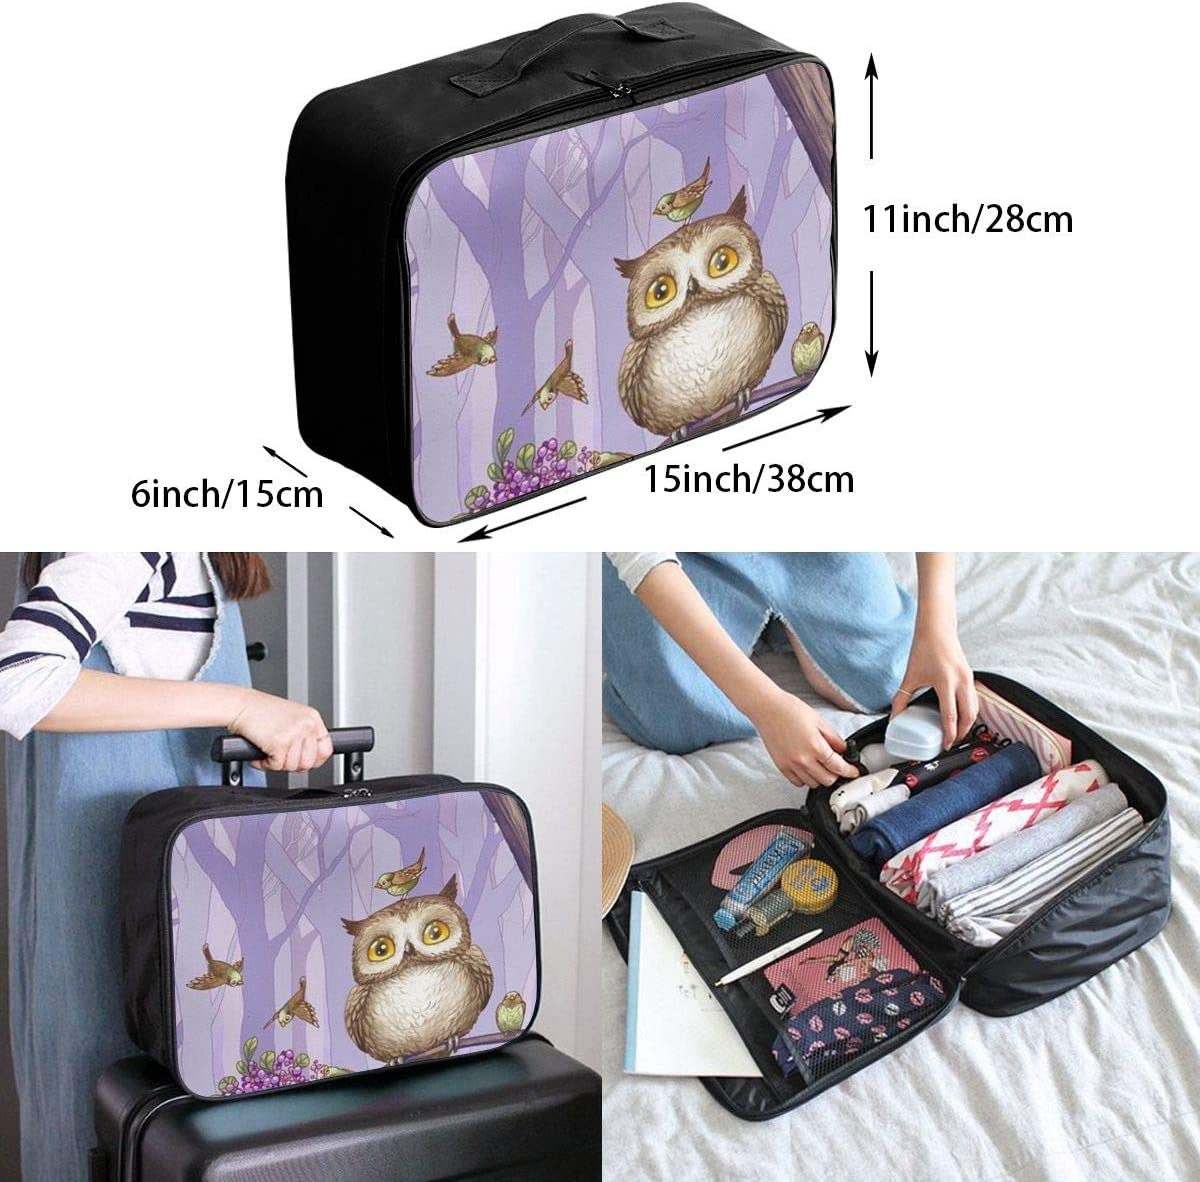 Cartoon Owl Travel Carry-on Luggage Weekender Bag Overnight Tote Flight Duffel In Trolley Handle